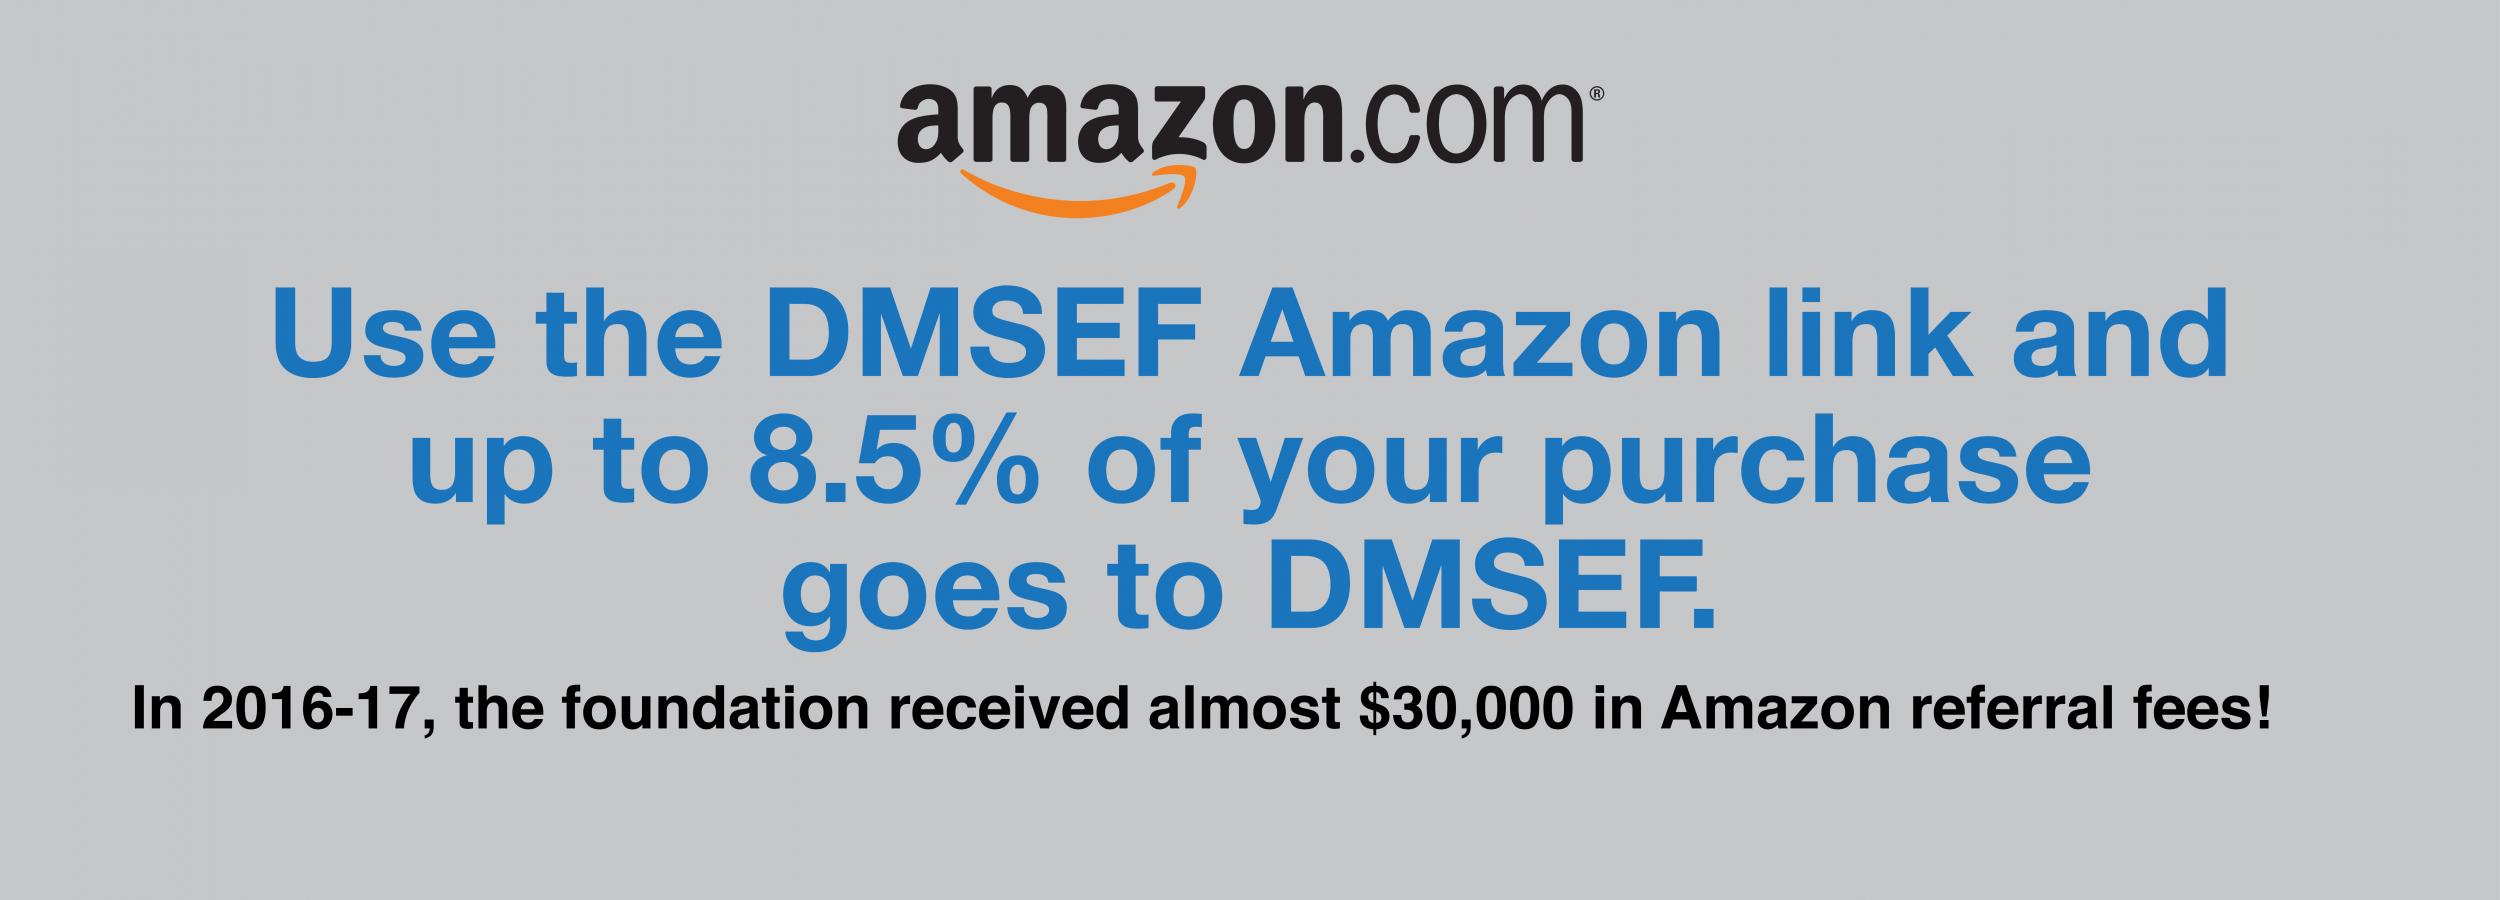 DMSEF website Slide Amazon 2017